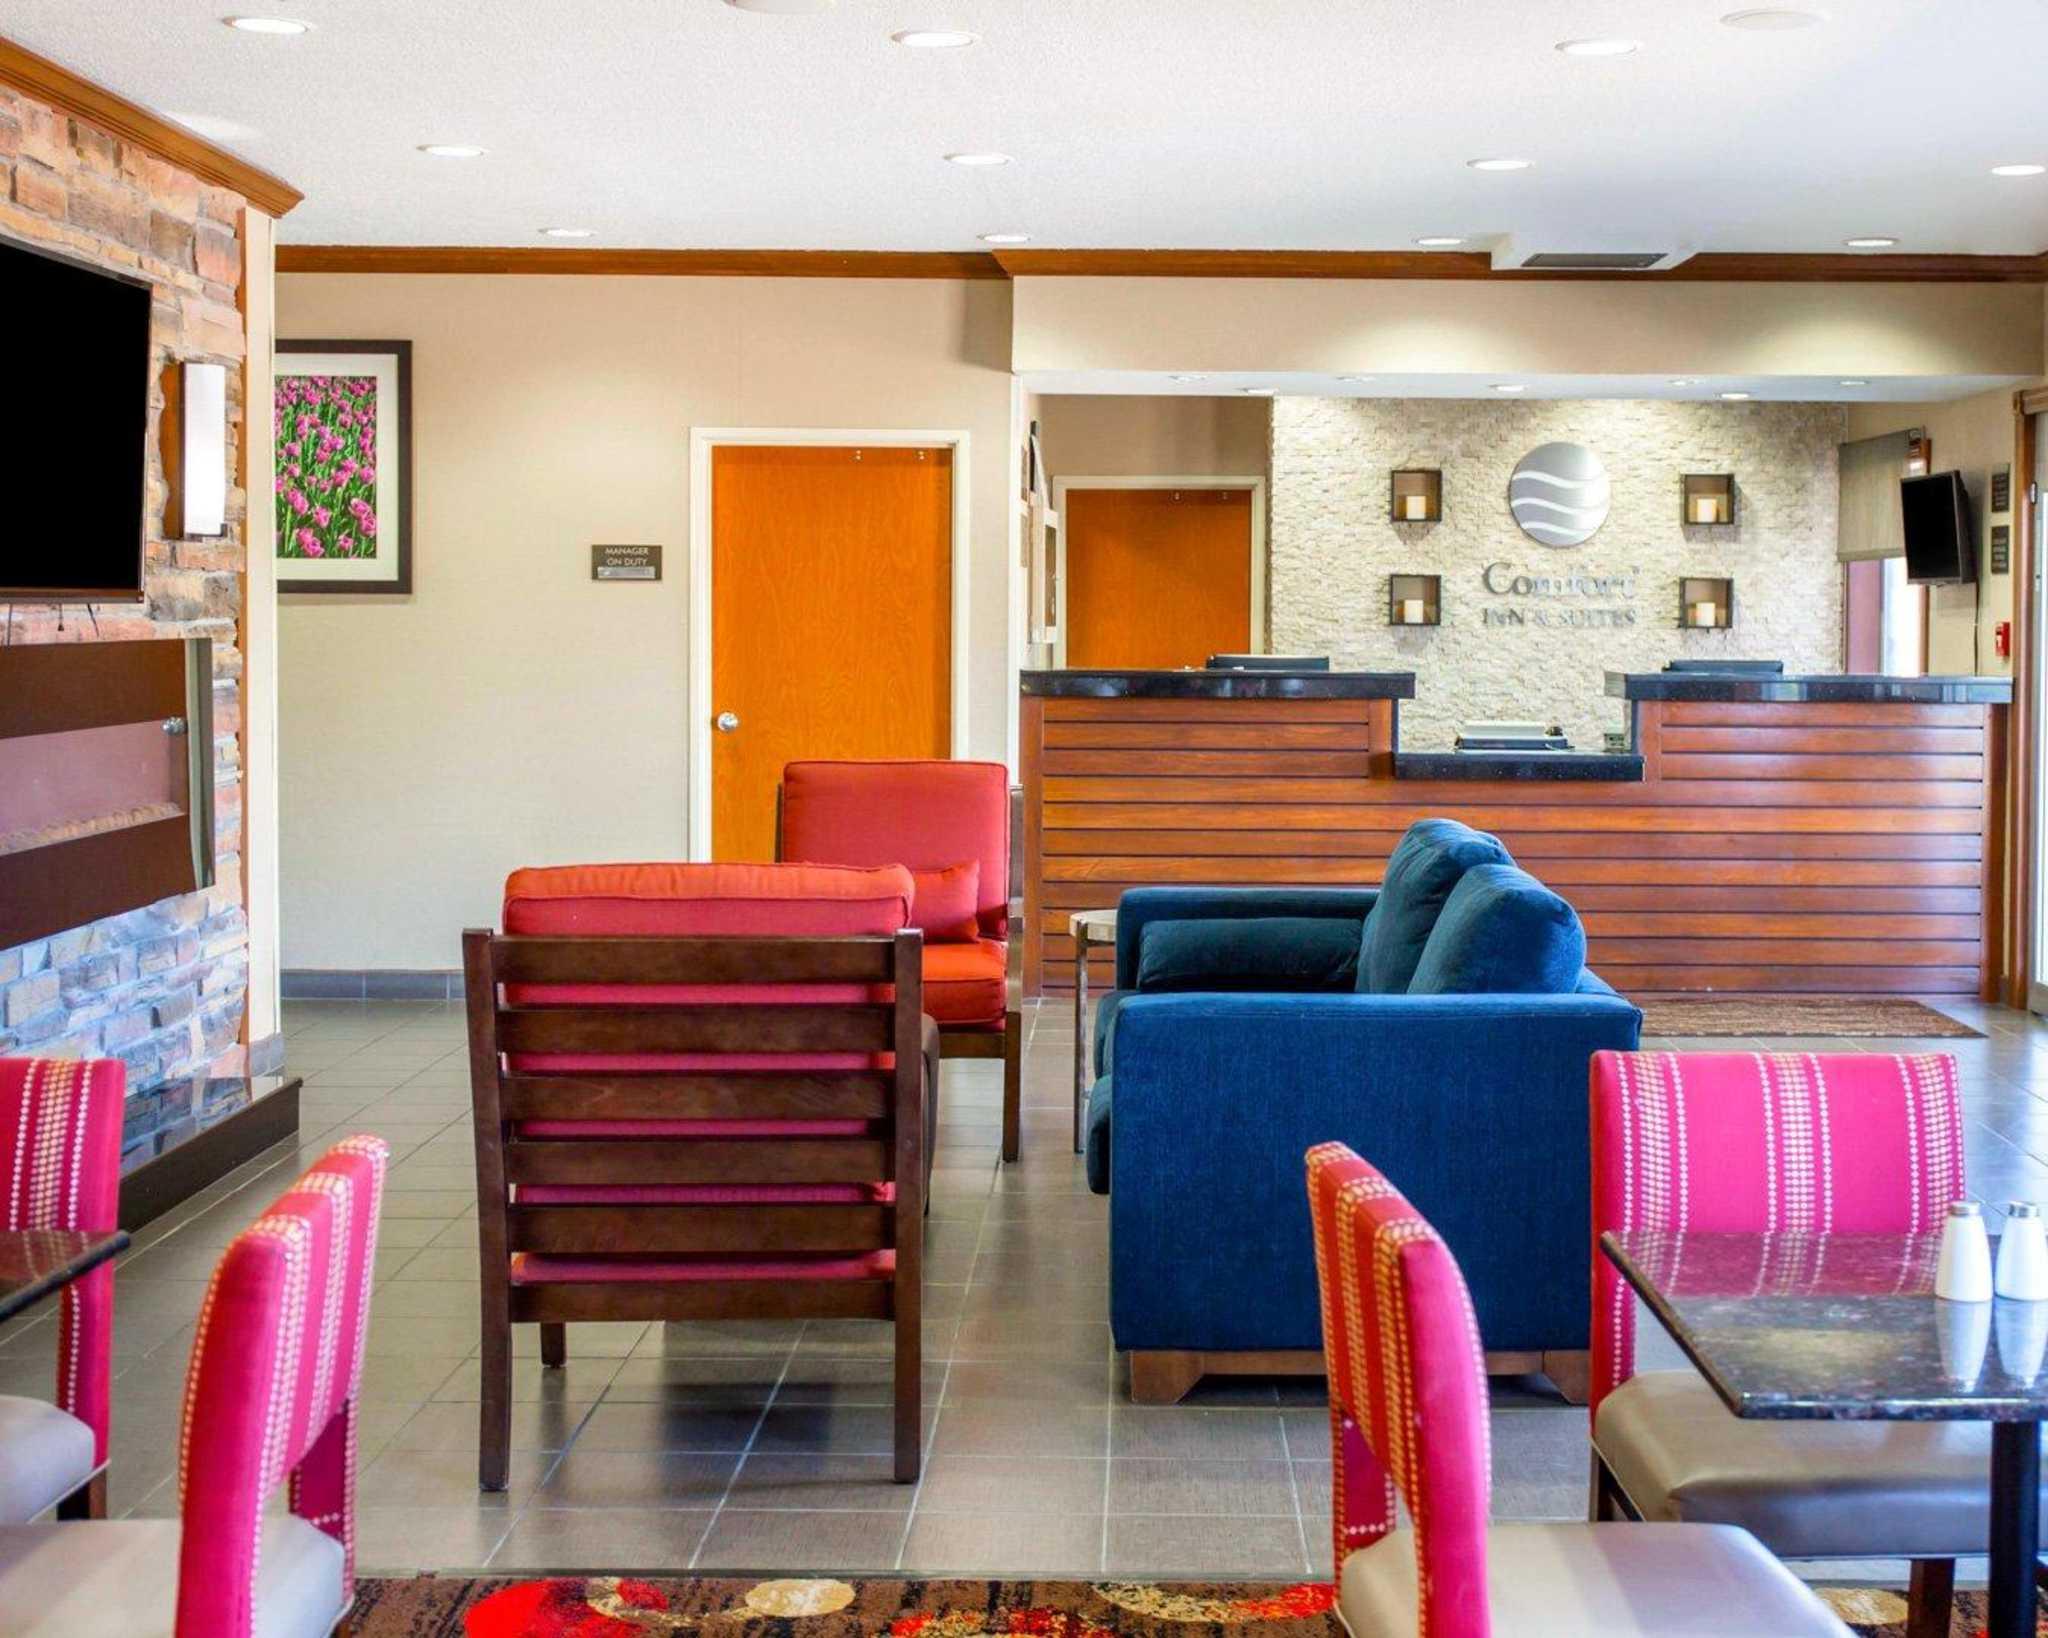 comfort inn suites at 214 west 9th street coralville. Black Bedroom Furniture Sets. Home Design Ideas